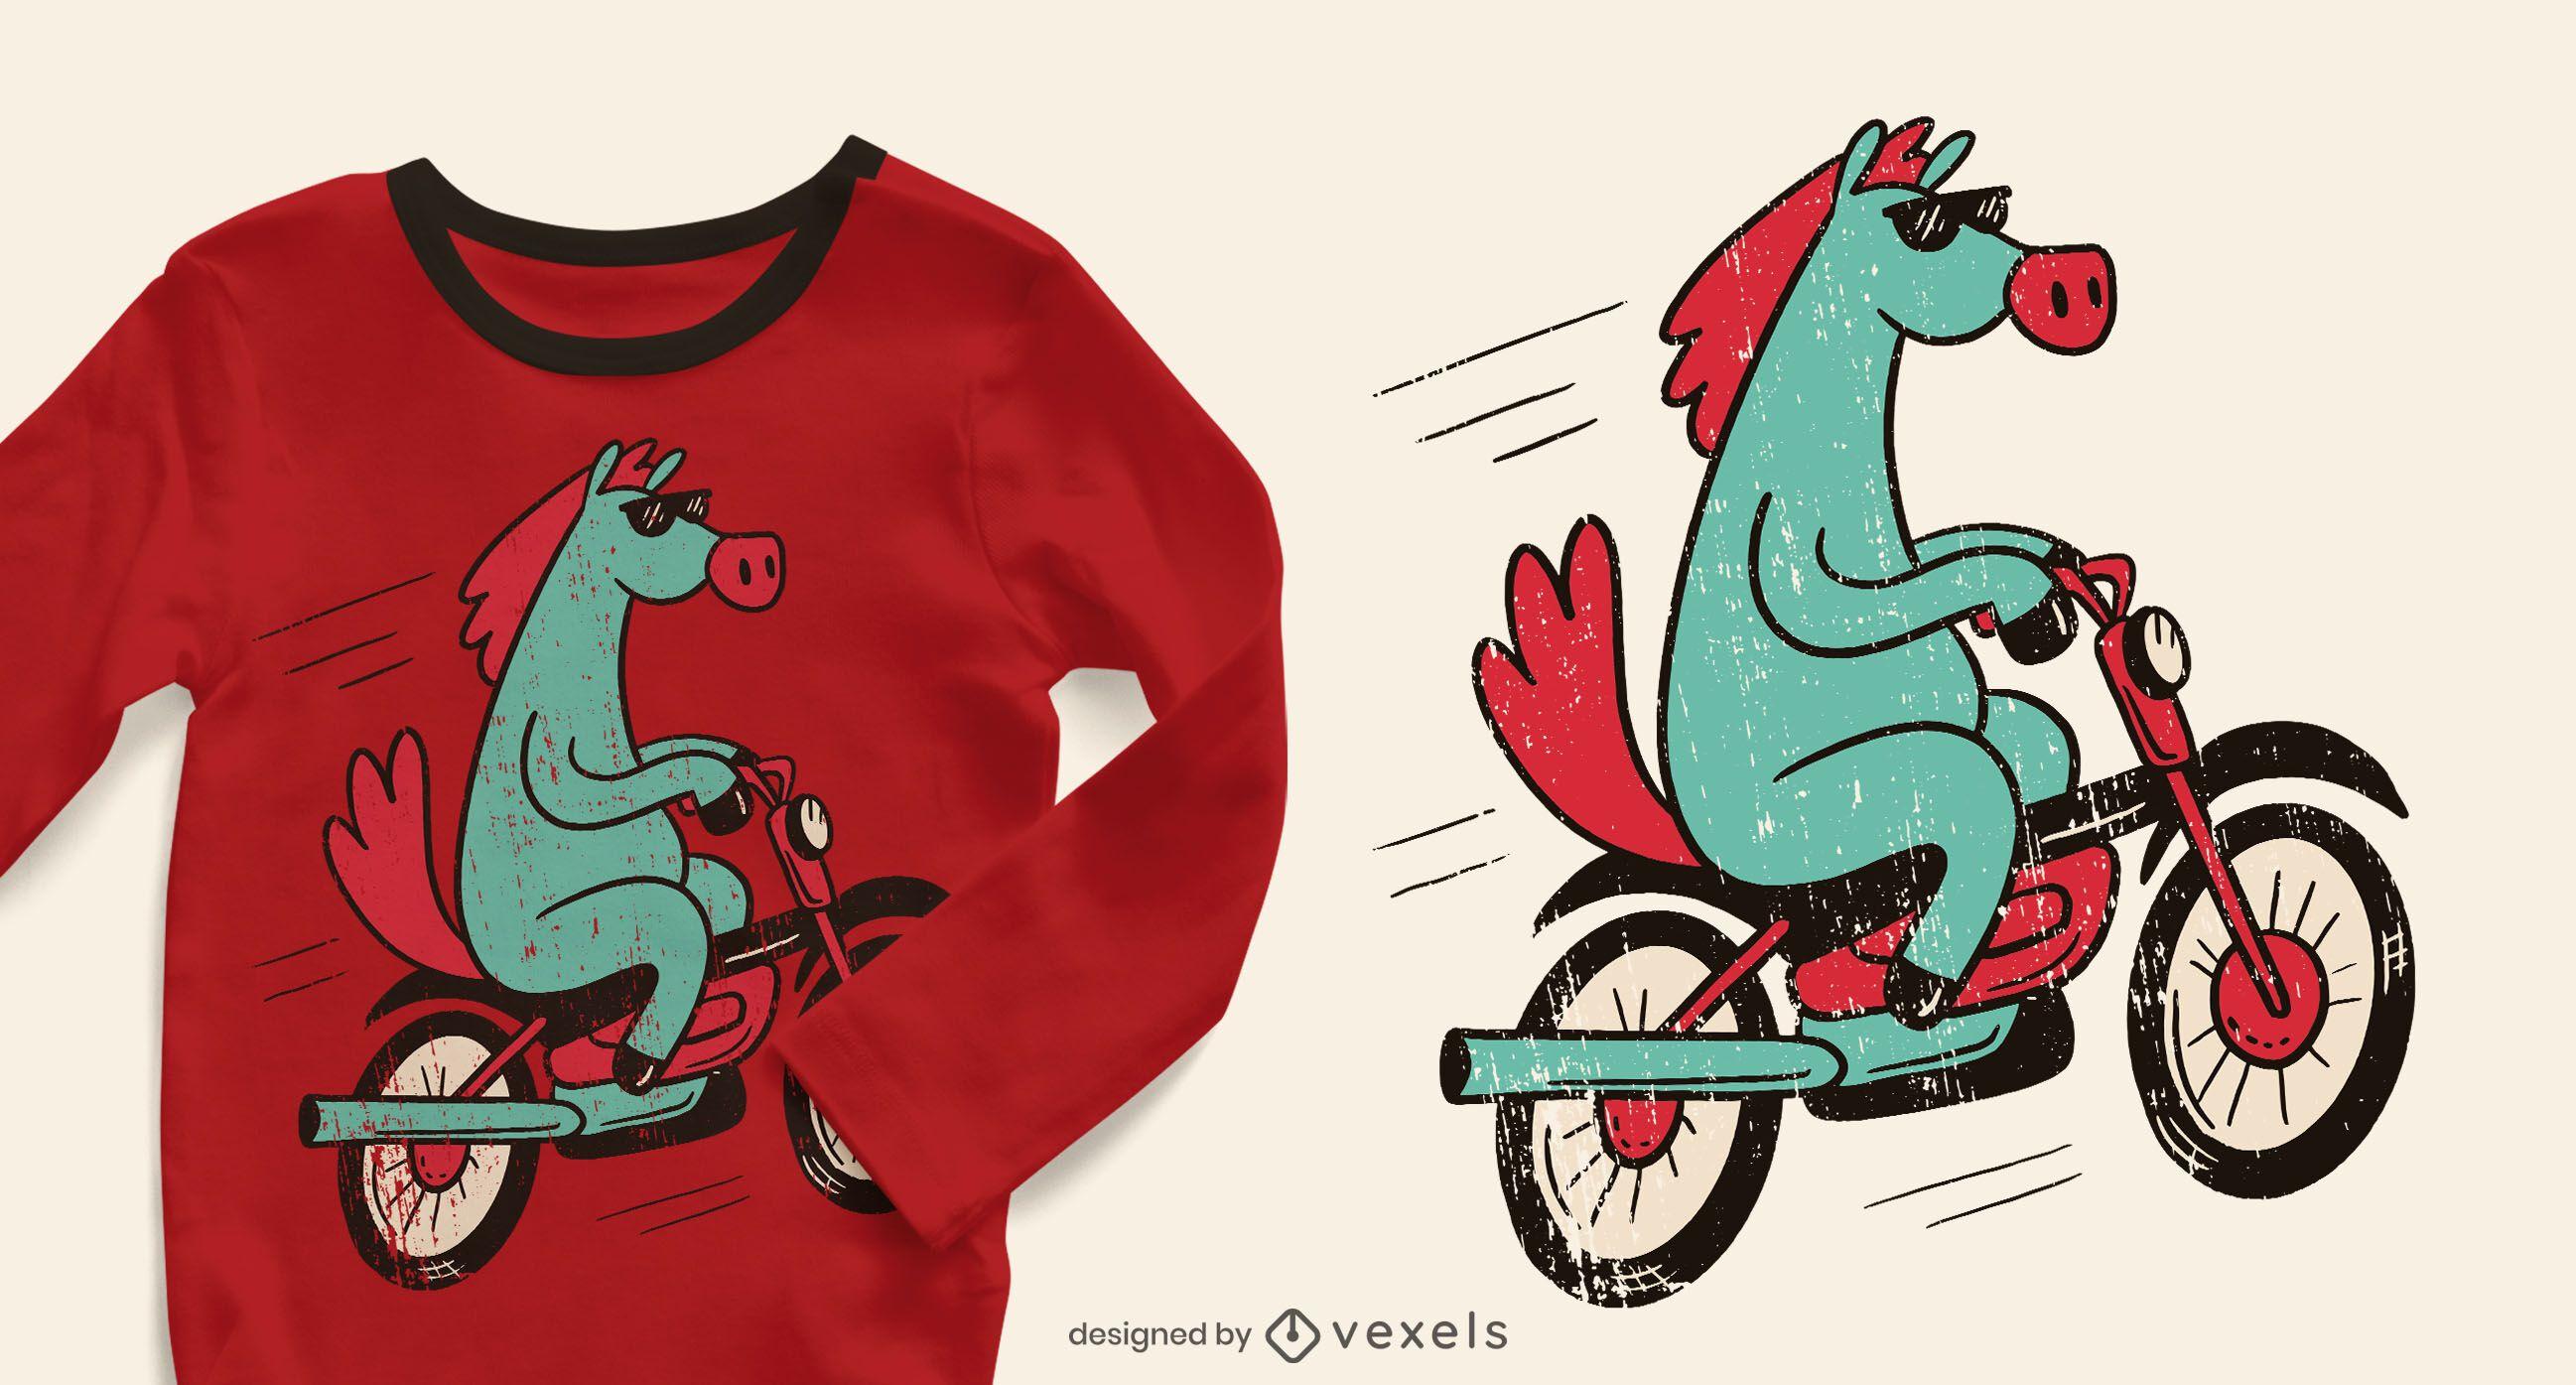 Horse bicycle t-shirt design